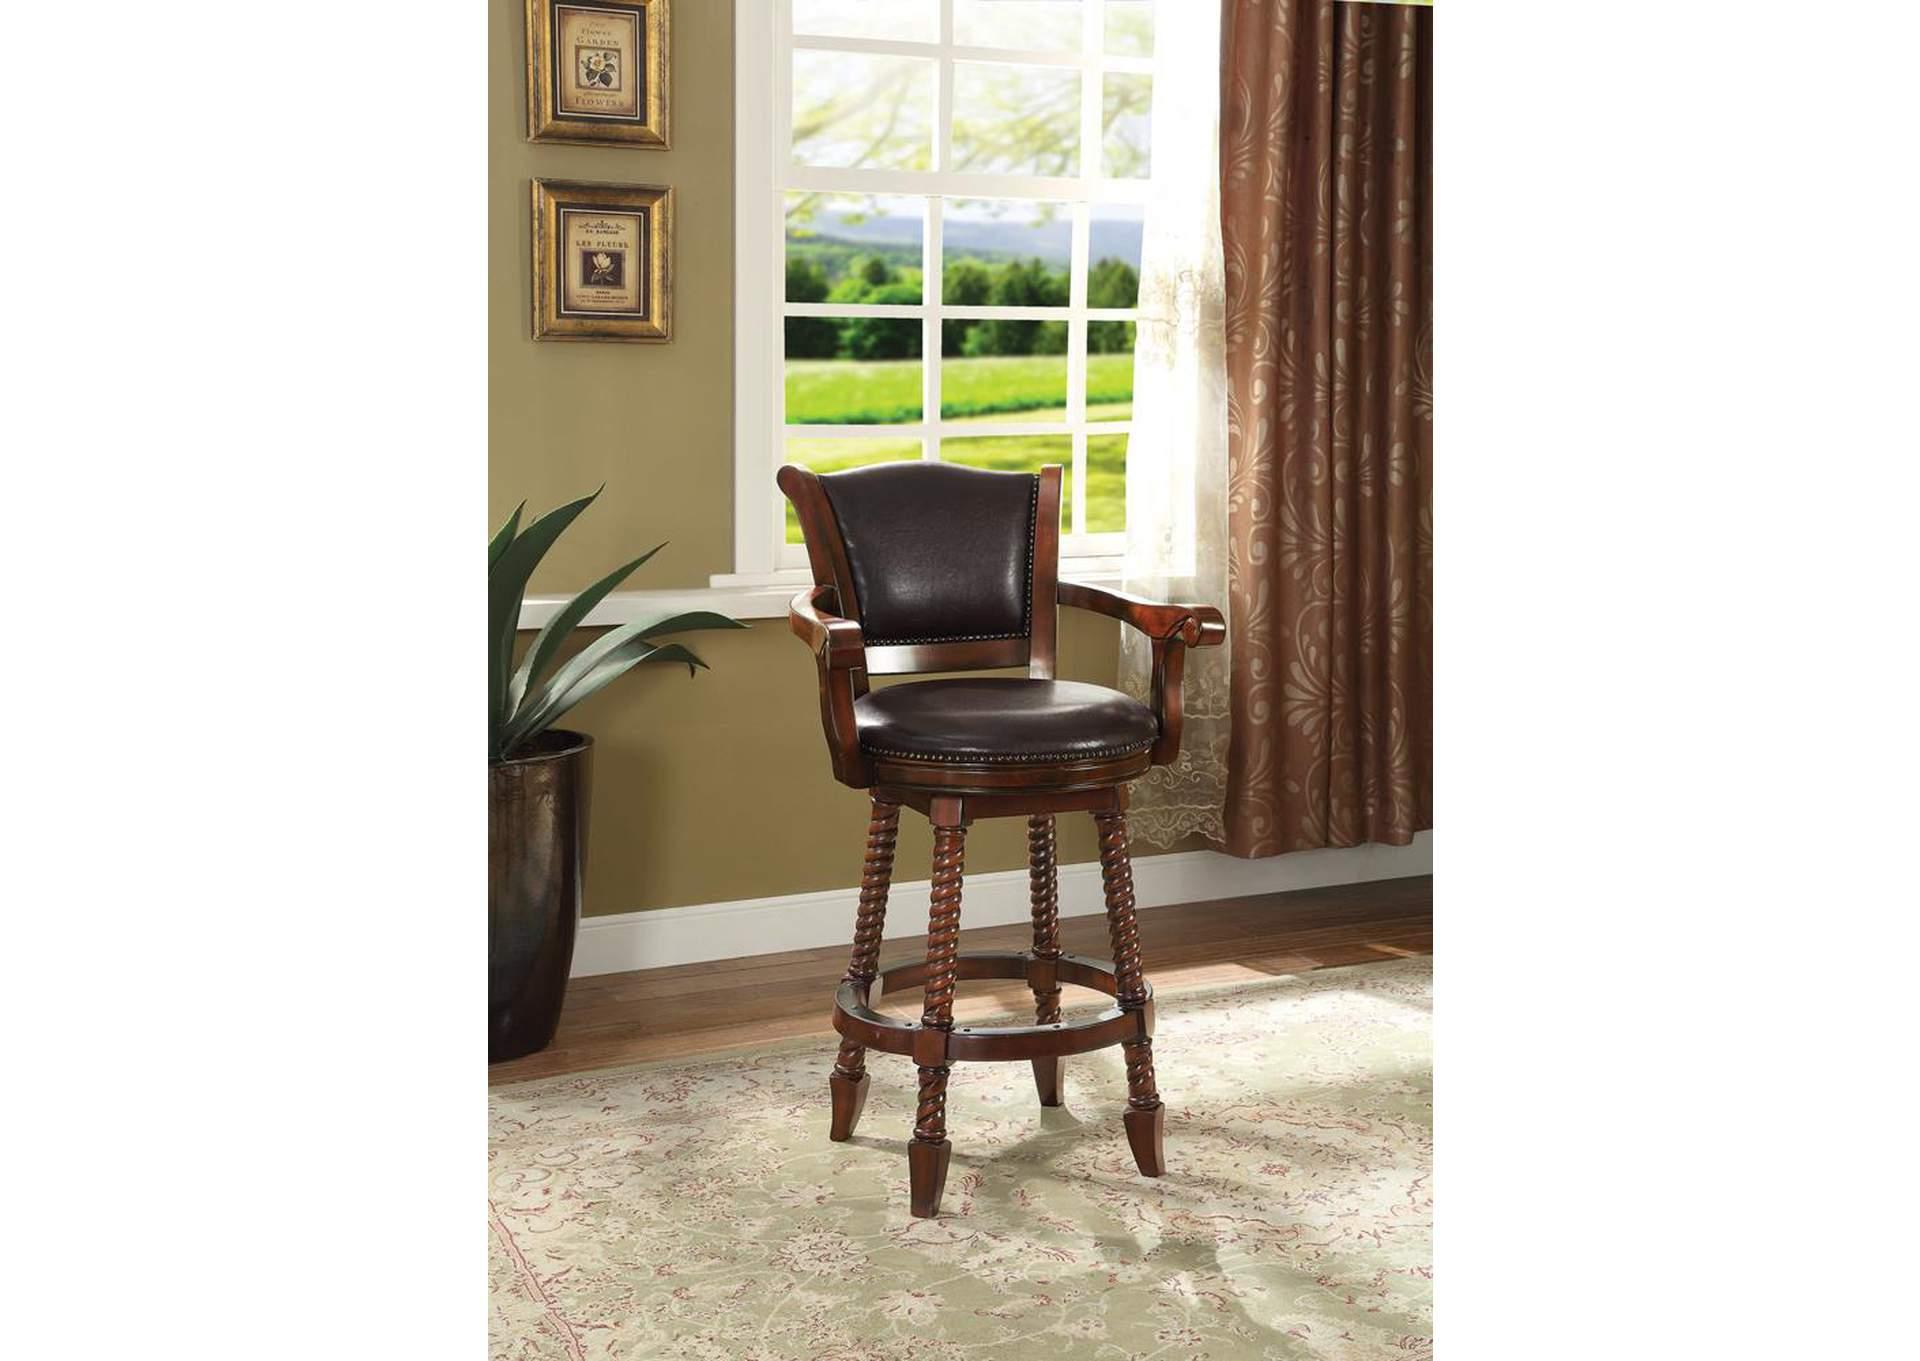 Furniture Merchandise Outlet Murfreesboro Hermitage Tn Bar Stool